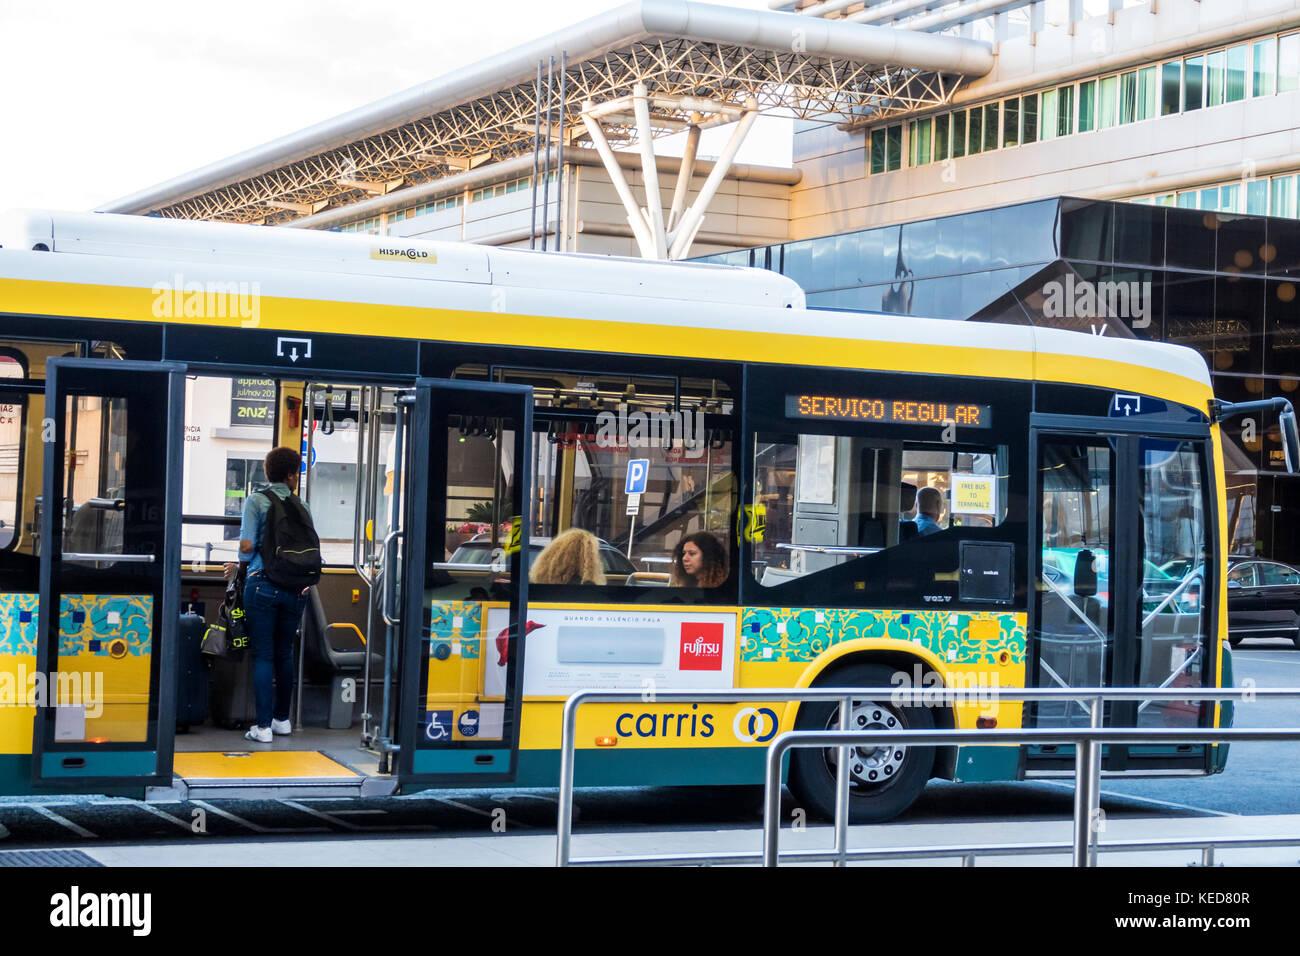 Lisbon Portugal Humberto Delgado Airport LIS Portela Airport ground transportation Carris public transit bus stop - Stock Image